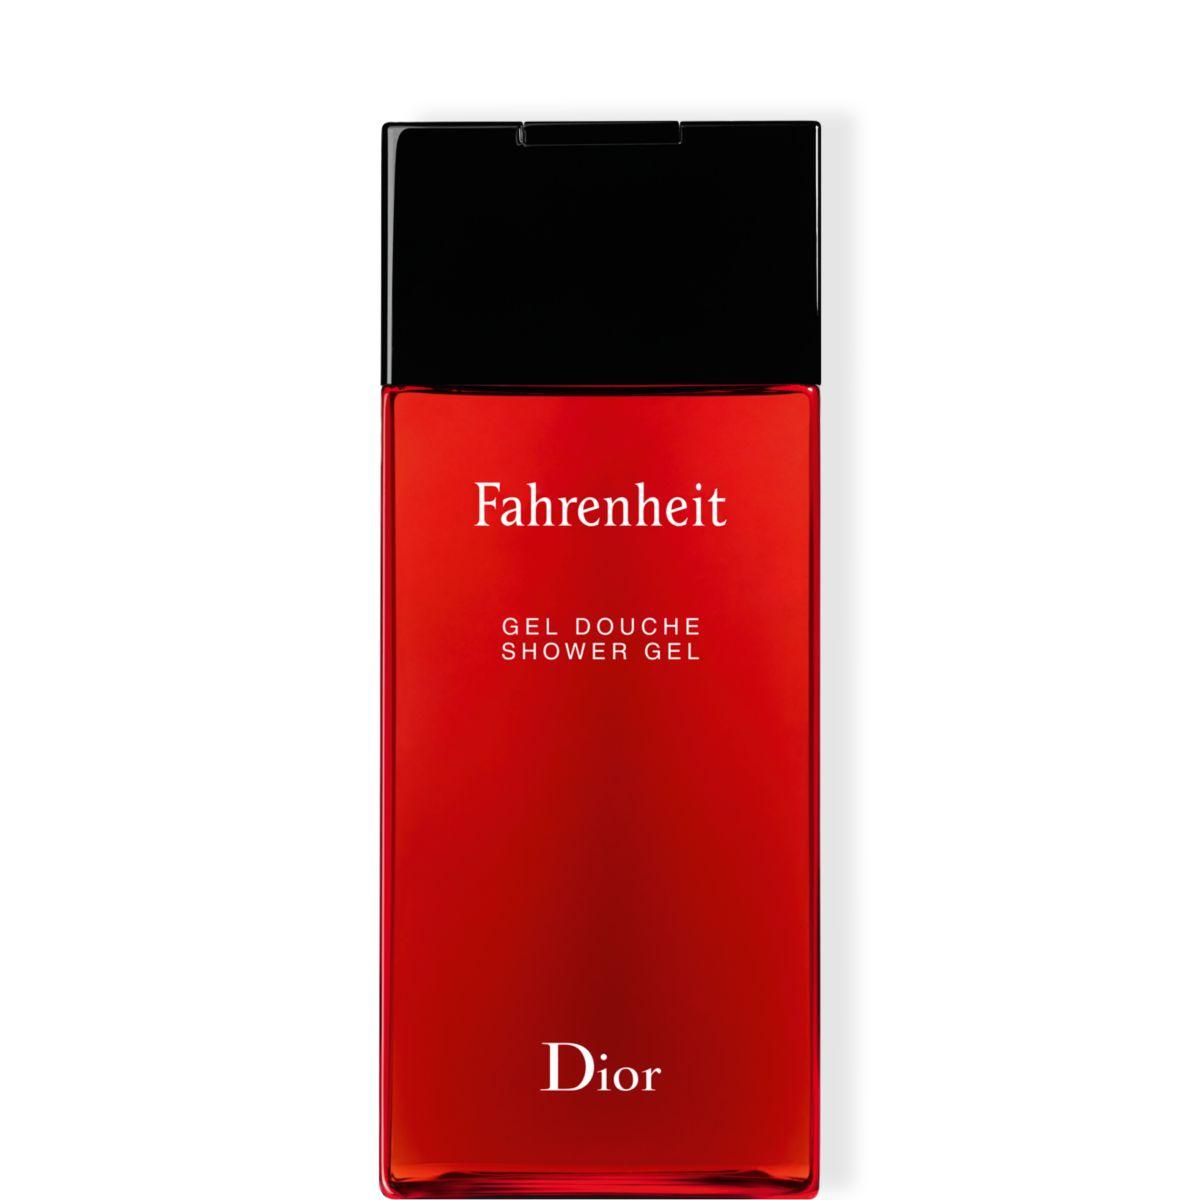 Dior - Fahrenheit - Gel douche 200 ml